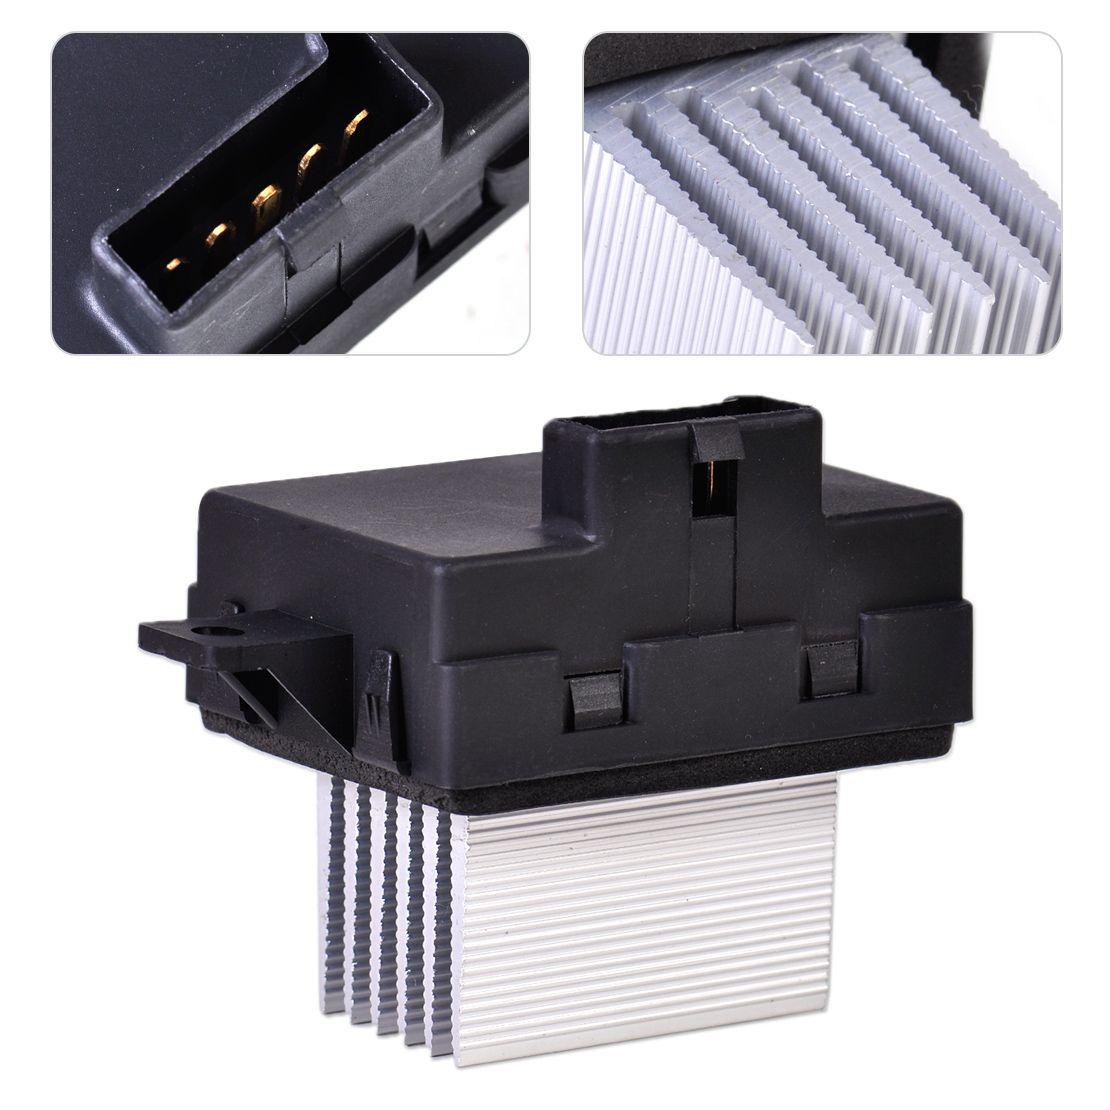 DWCX HVAC Heater Blower Motor Resistor 8E5Z19E624A JA1712 YH1825l EBY-100342 for Ford Fusion Lincoln MKZ Zephyr Mercury Milan